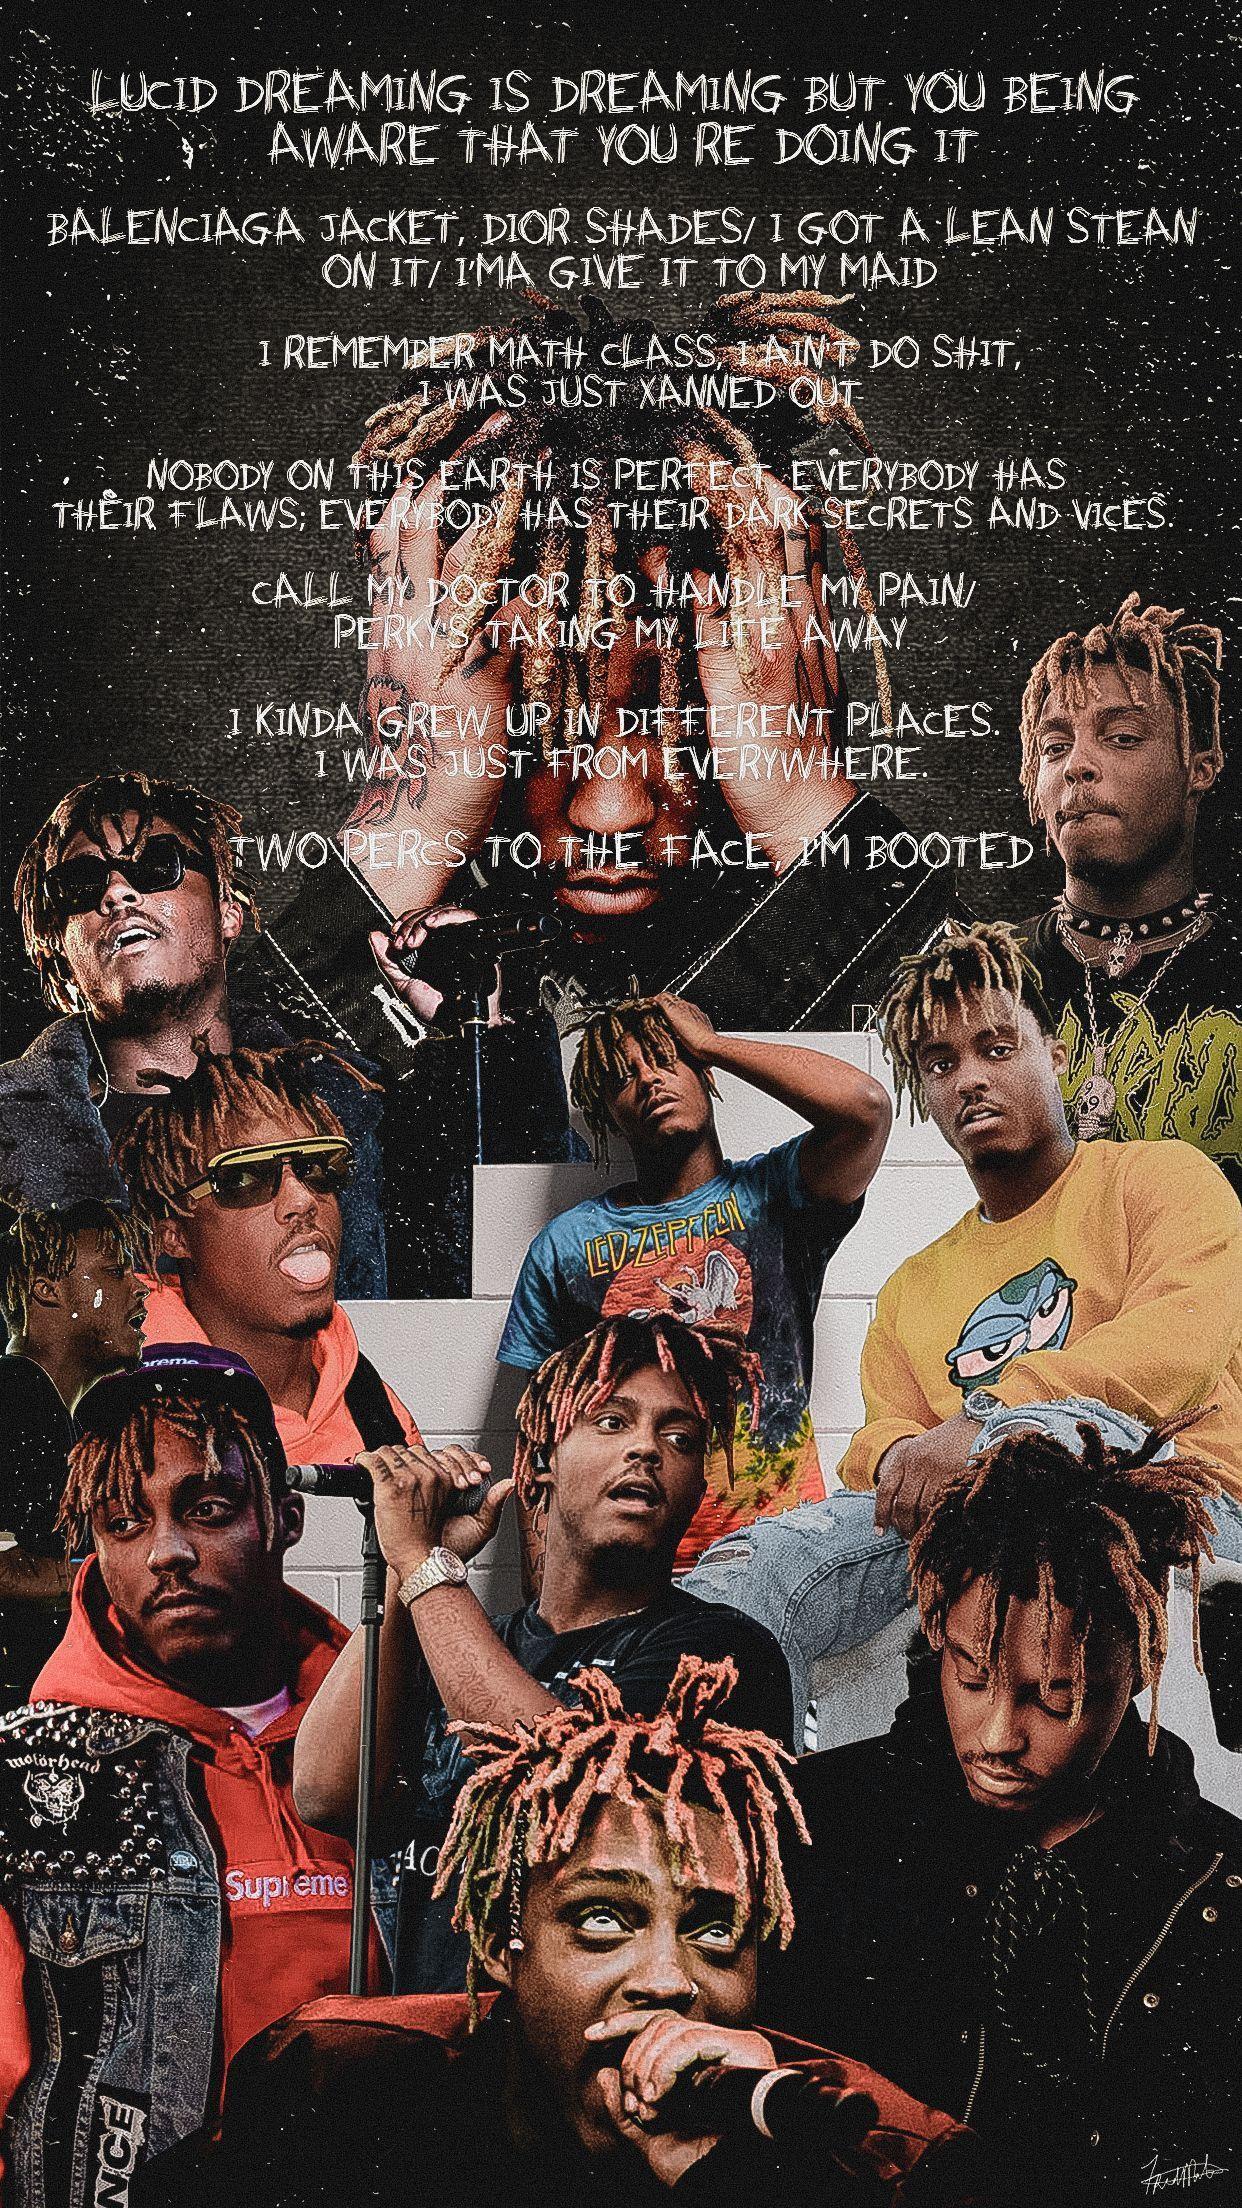 Juice Wrld Wallpaper Juicewrldwallpaperiphone Juicewrld Fashion Wallpaper Iphonewallpaper Art Juicewrldwallpa In 2020 Juice Rapper World Wallpaper Rap Wallpaper